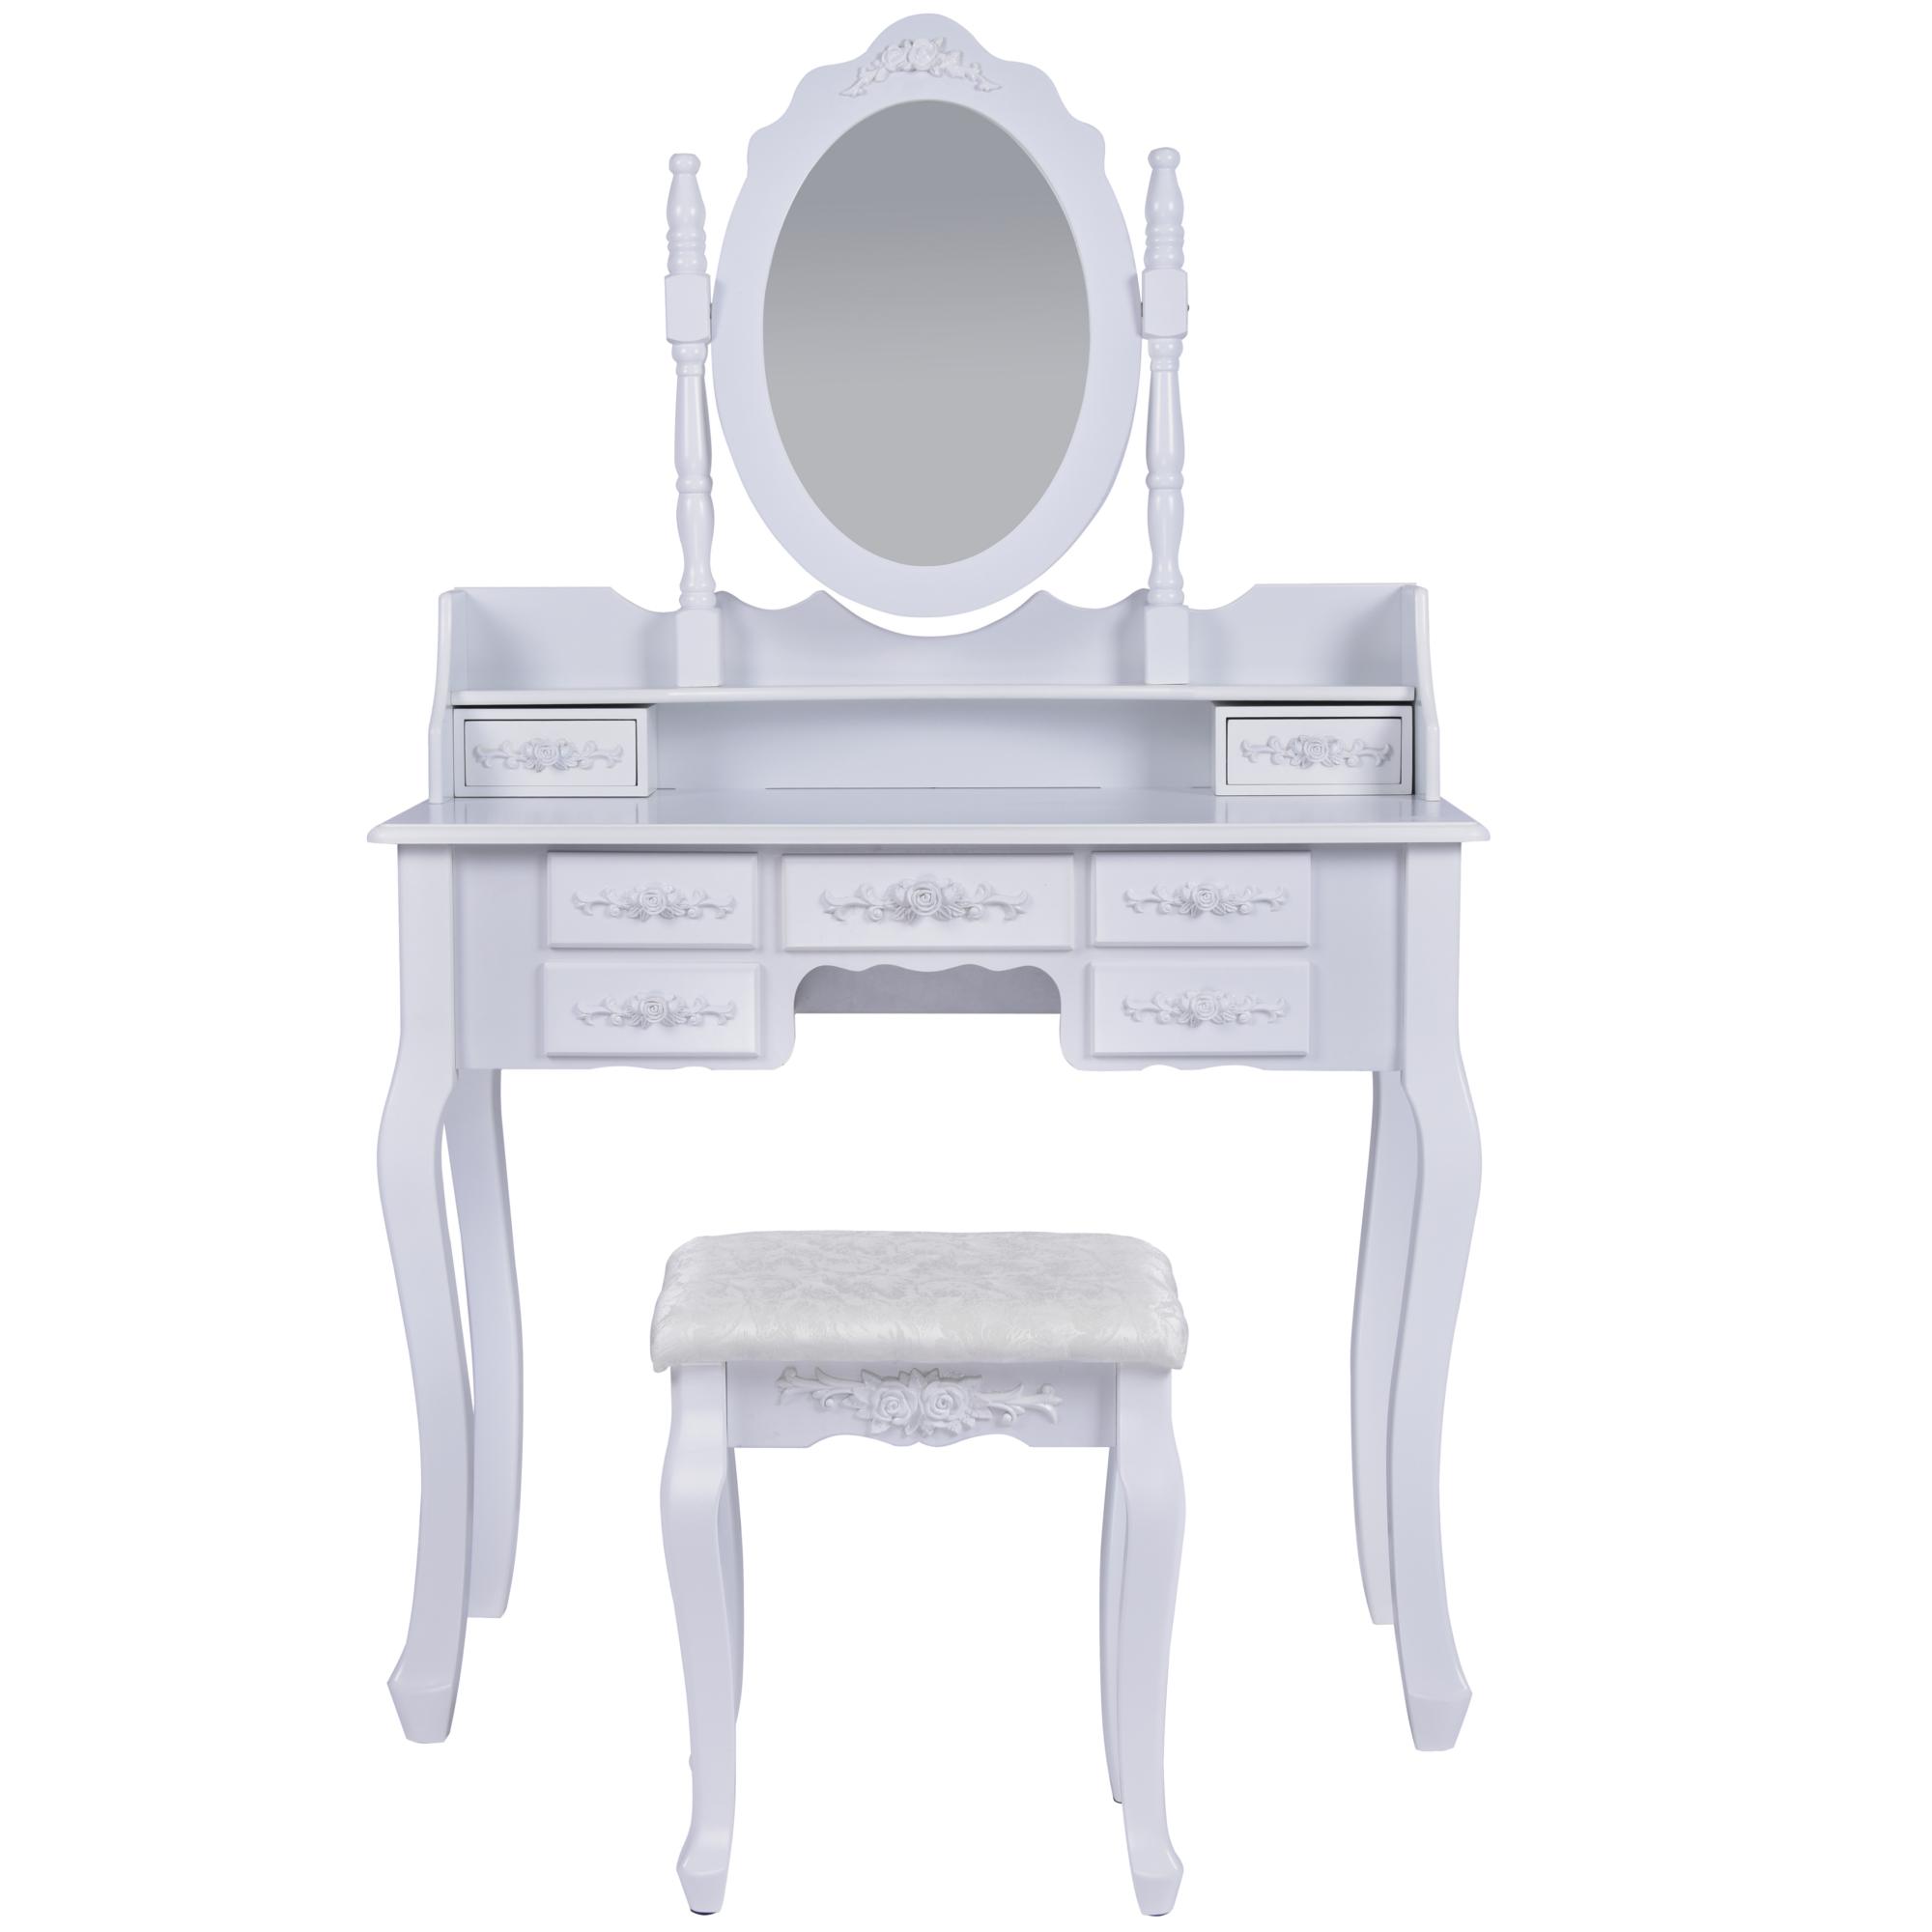 schminktisch roma wei frisiertisch set schminkkommode mit. Black Bedroom Furniture Sets. Home Design Ideas